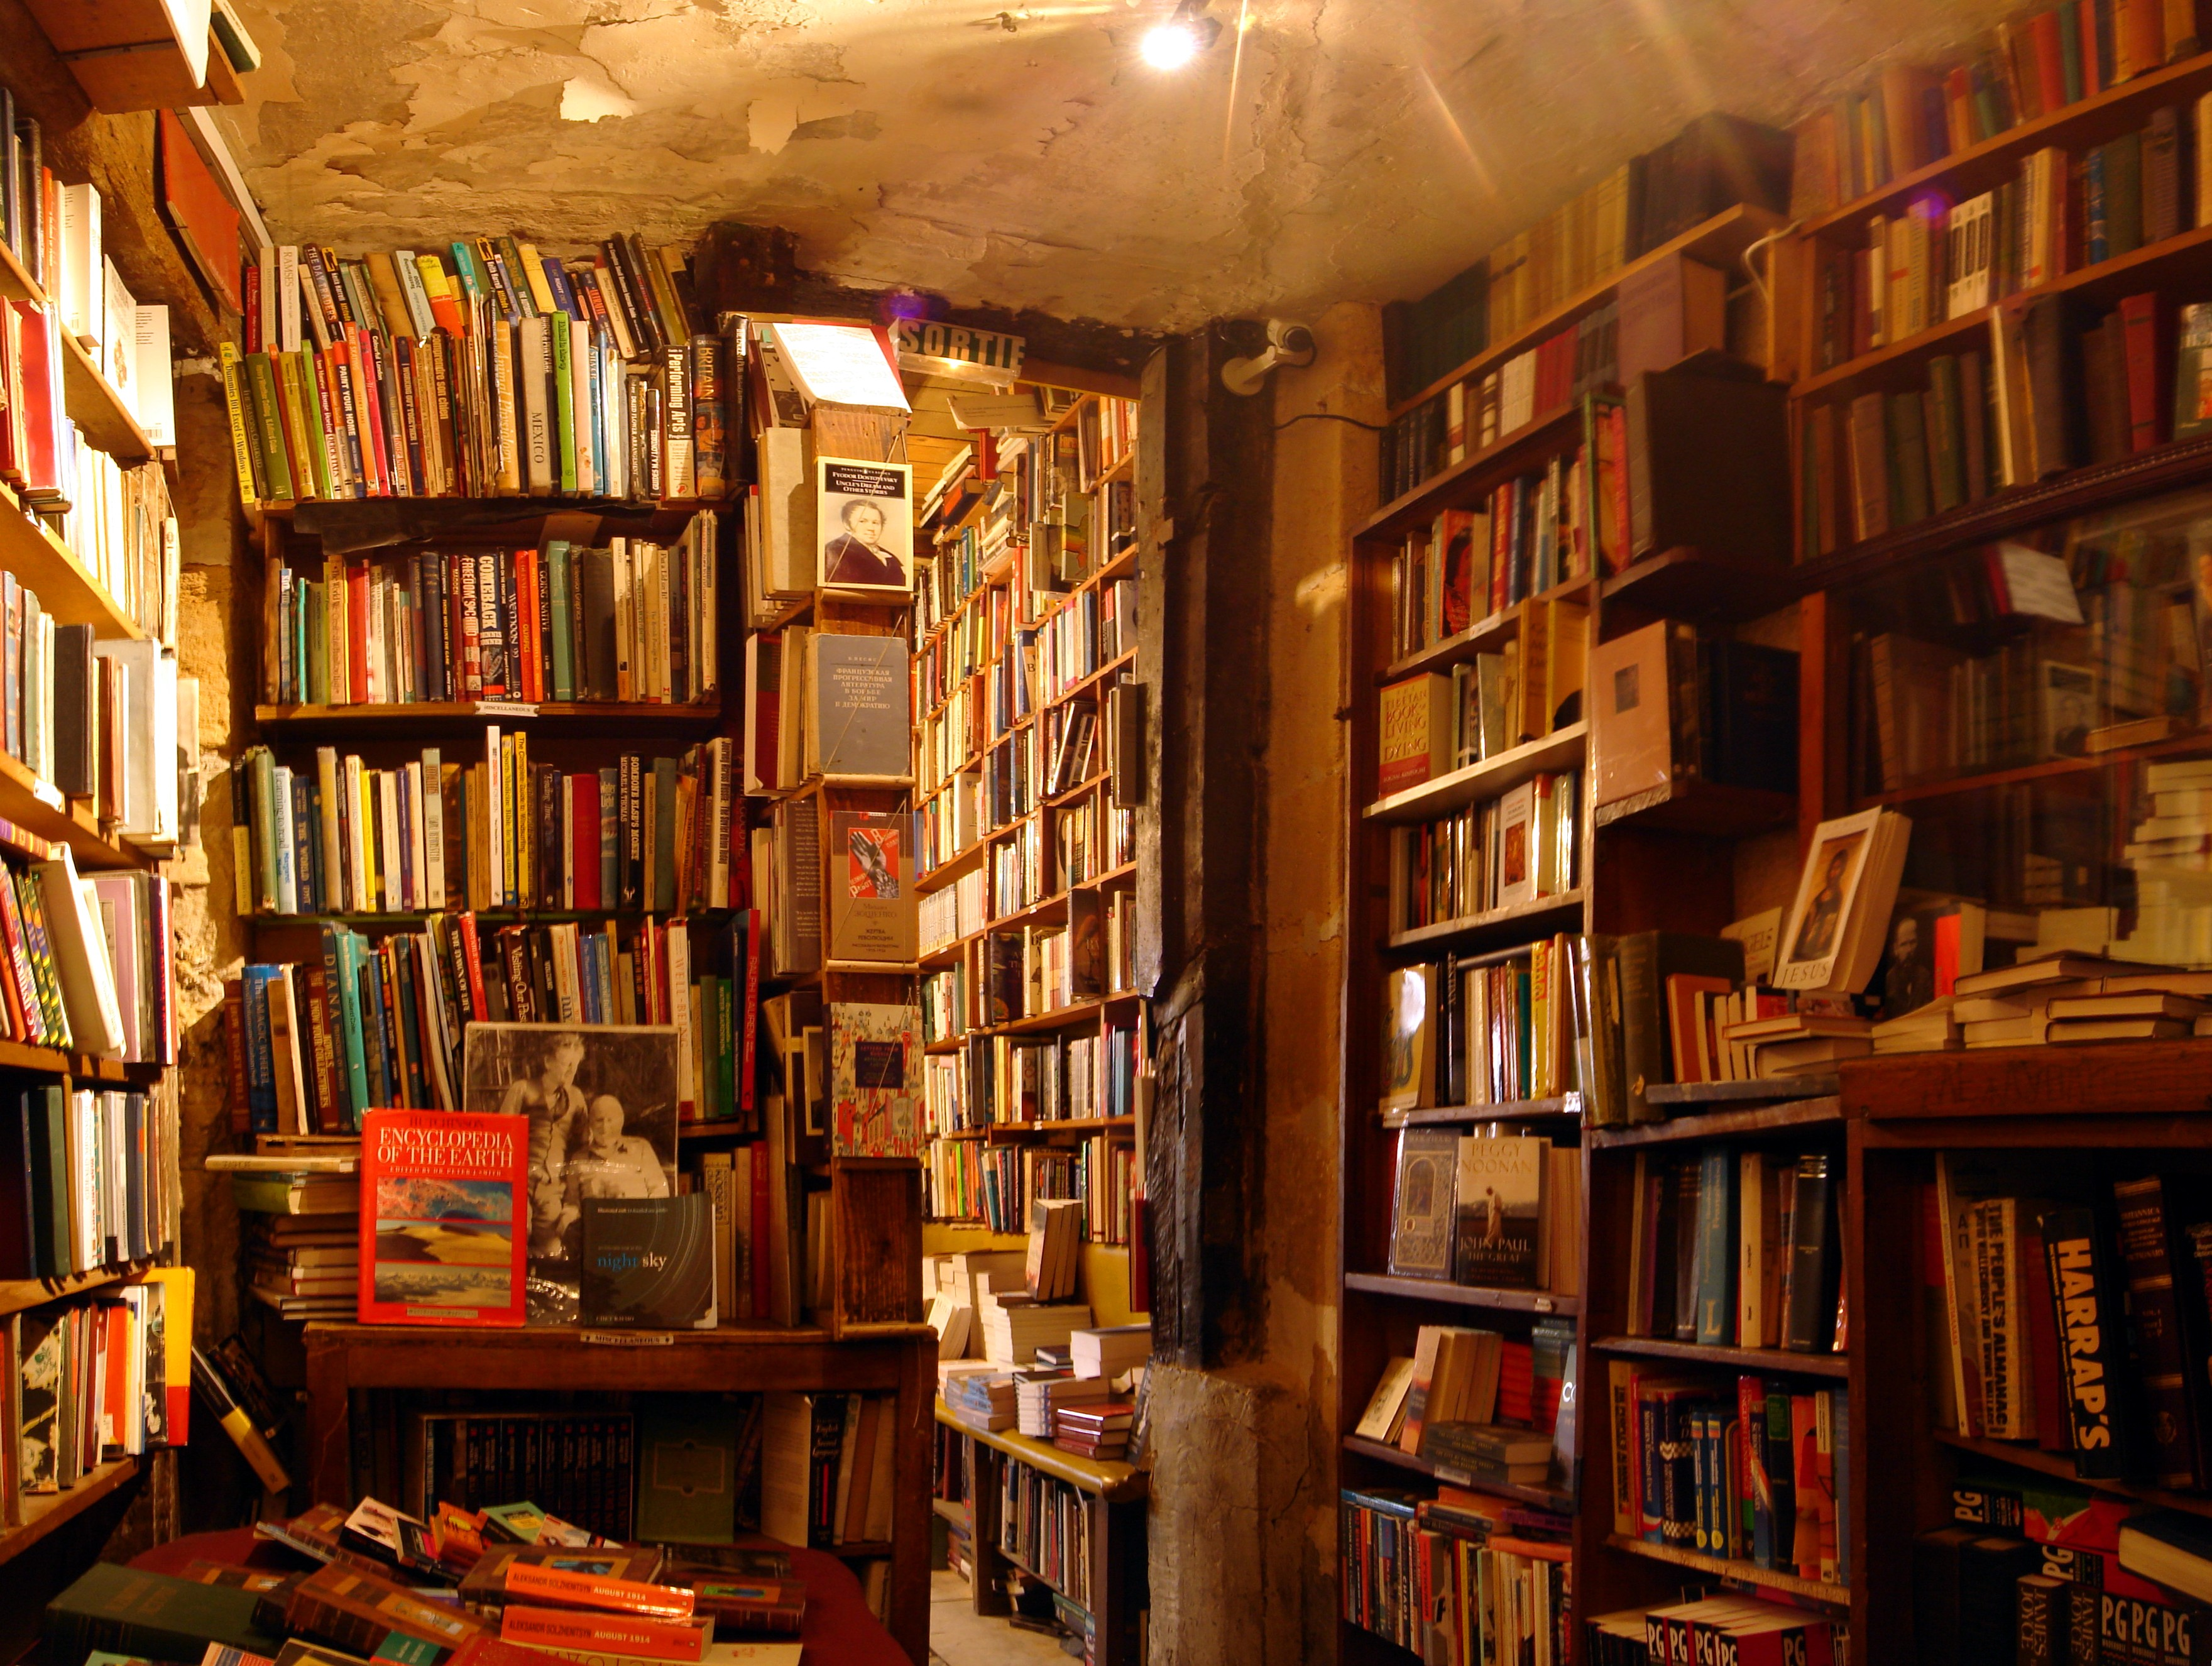 bookstore books shakespeare company bookshop browsing chaos theory paris library accelerando readers librerie english room libreria shakespear cozy stross exceptional